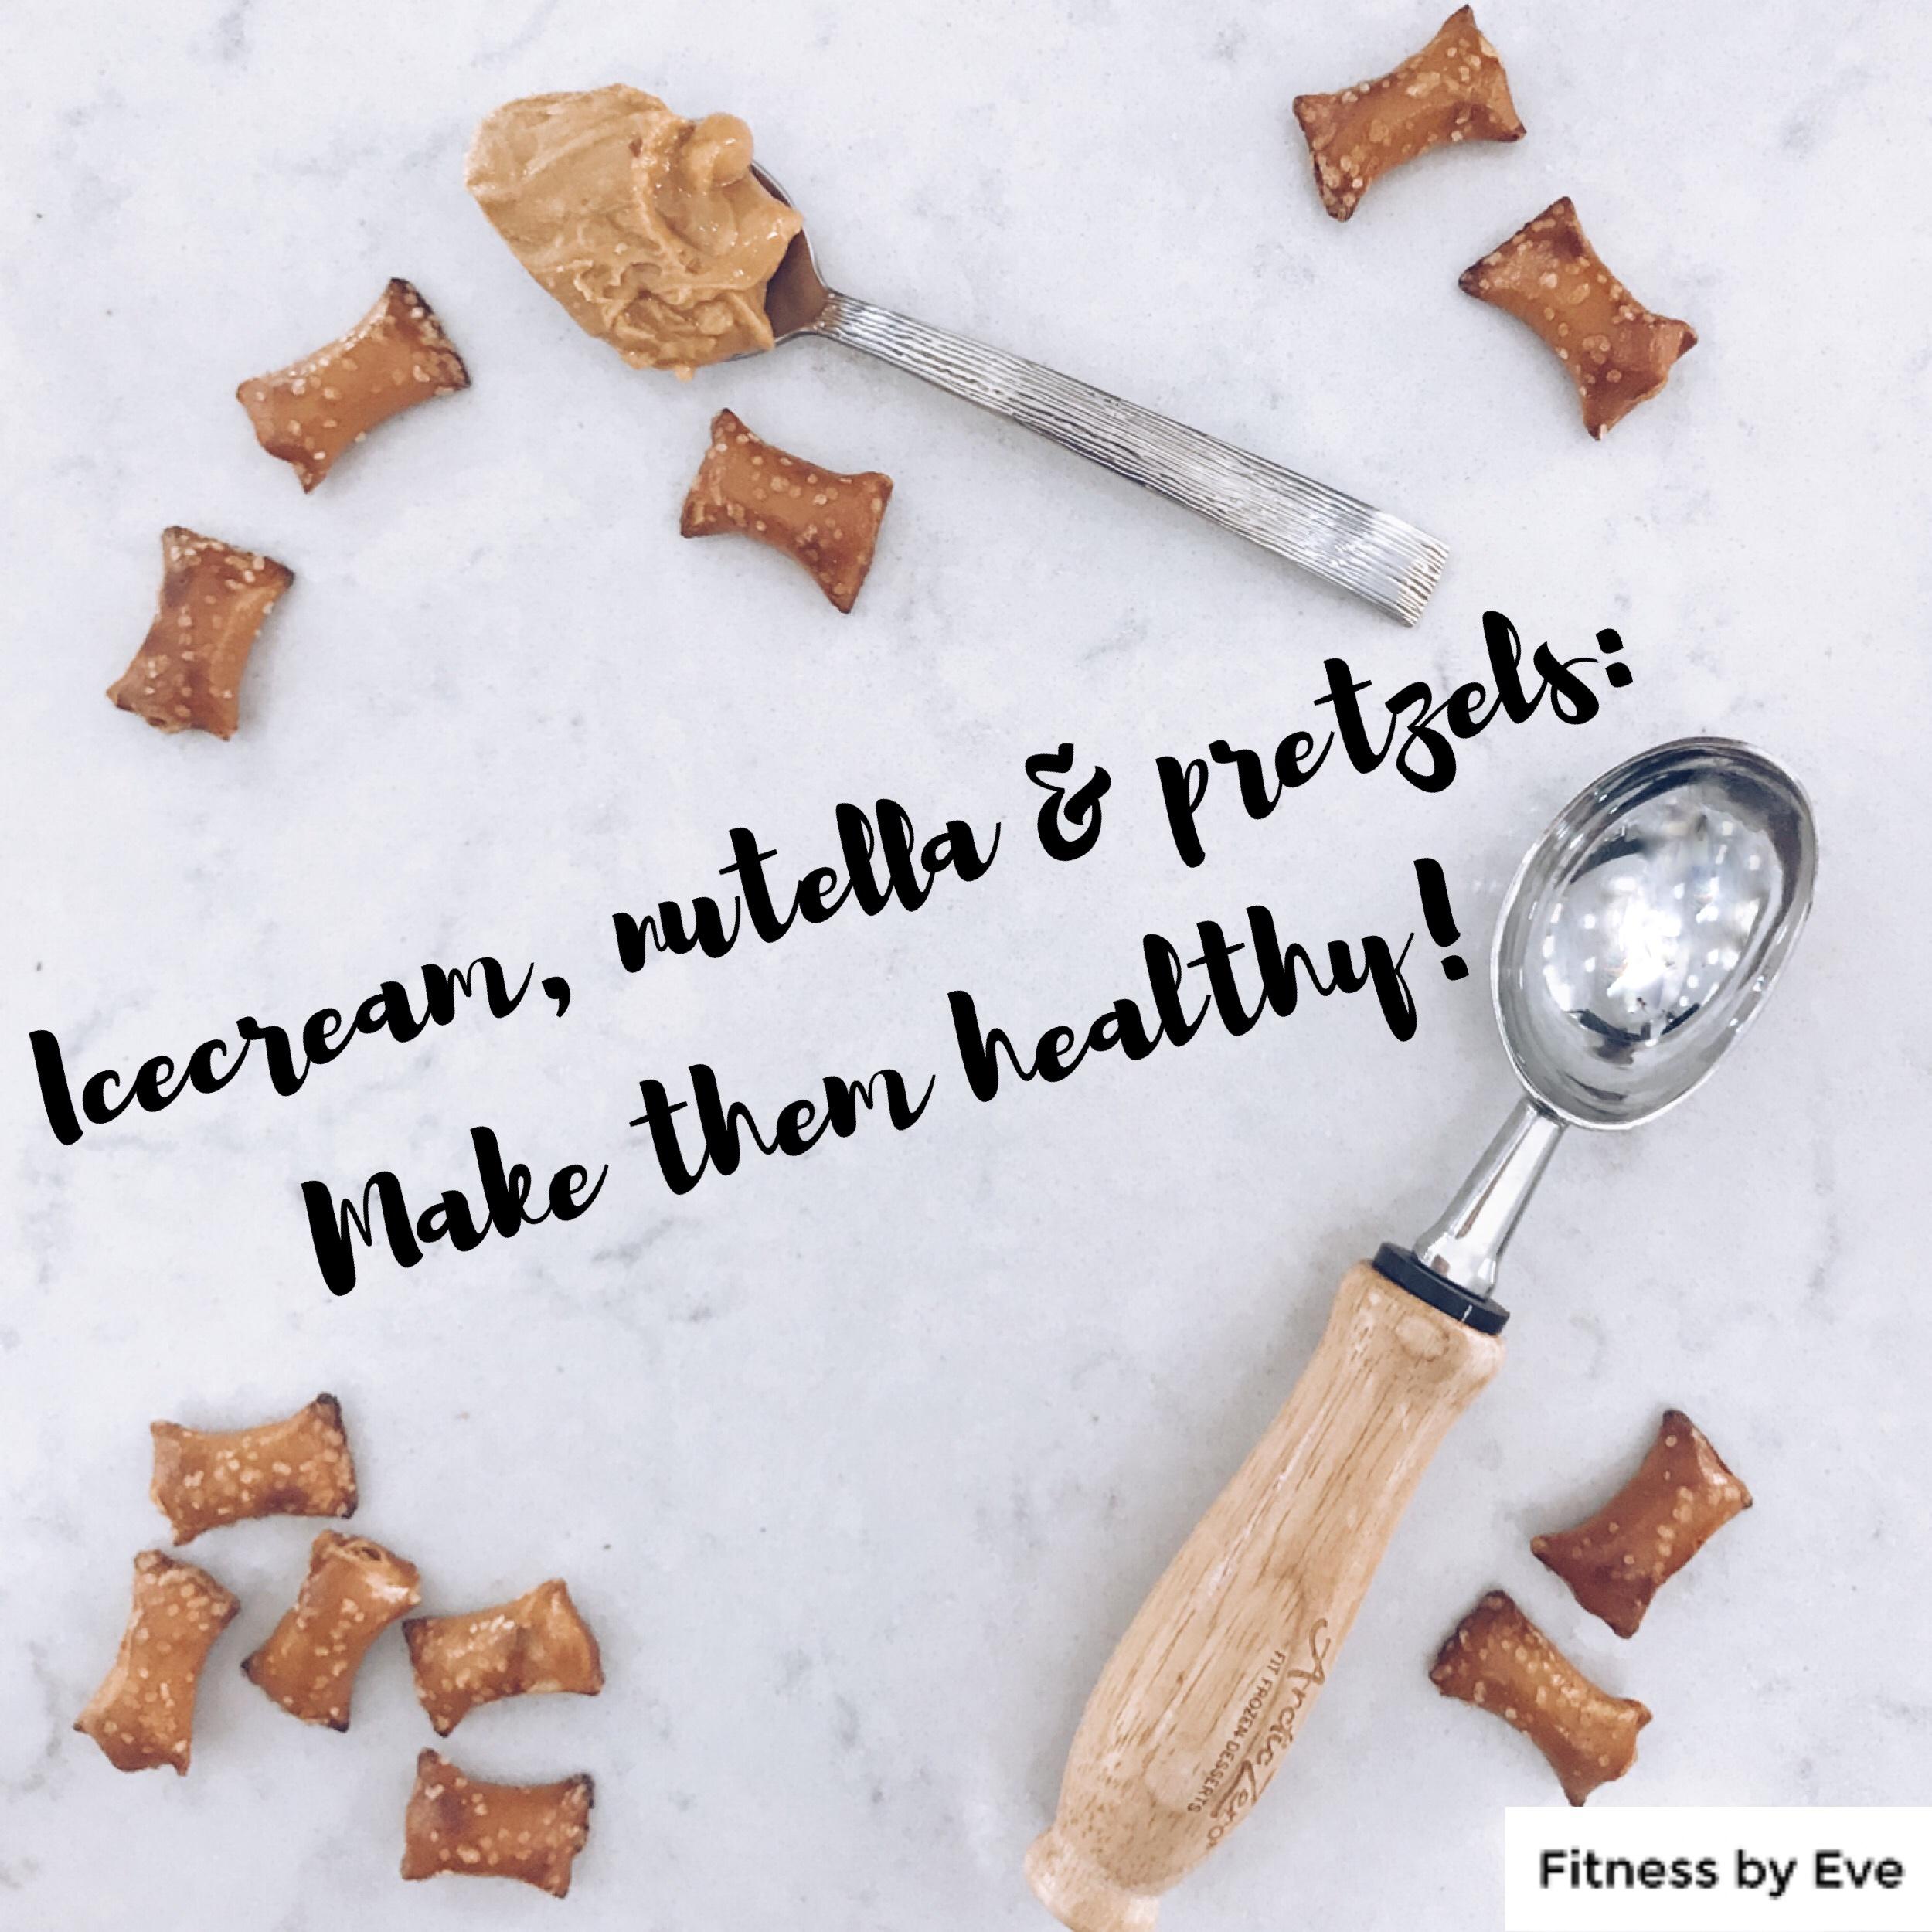 Pretzels, ice cream scoop, peanut butter on spoon